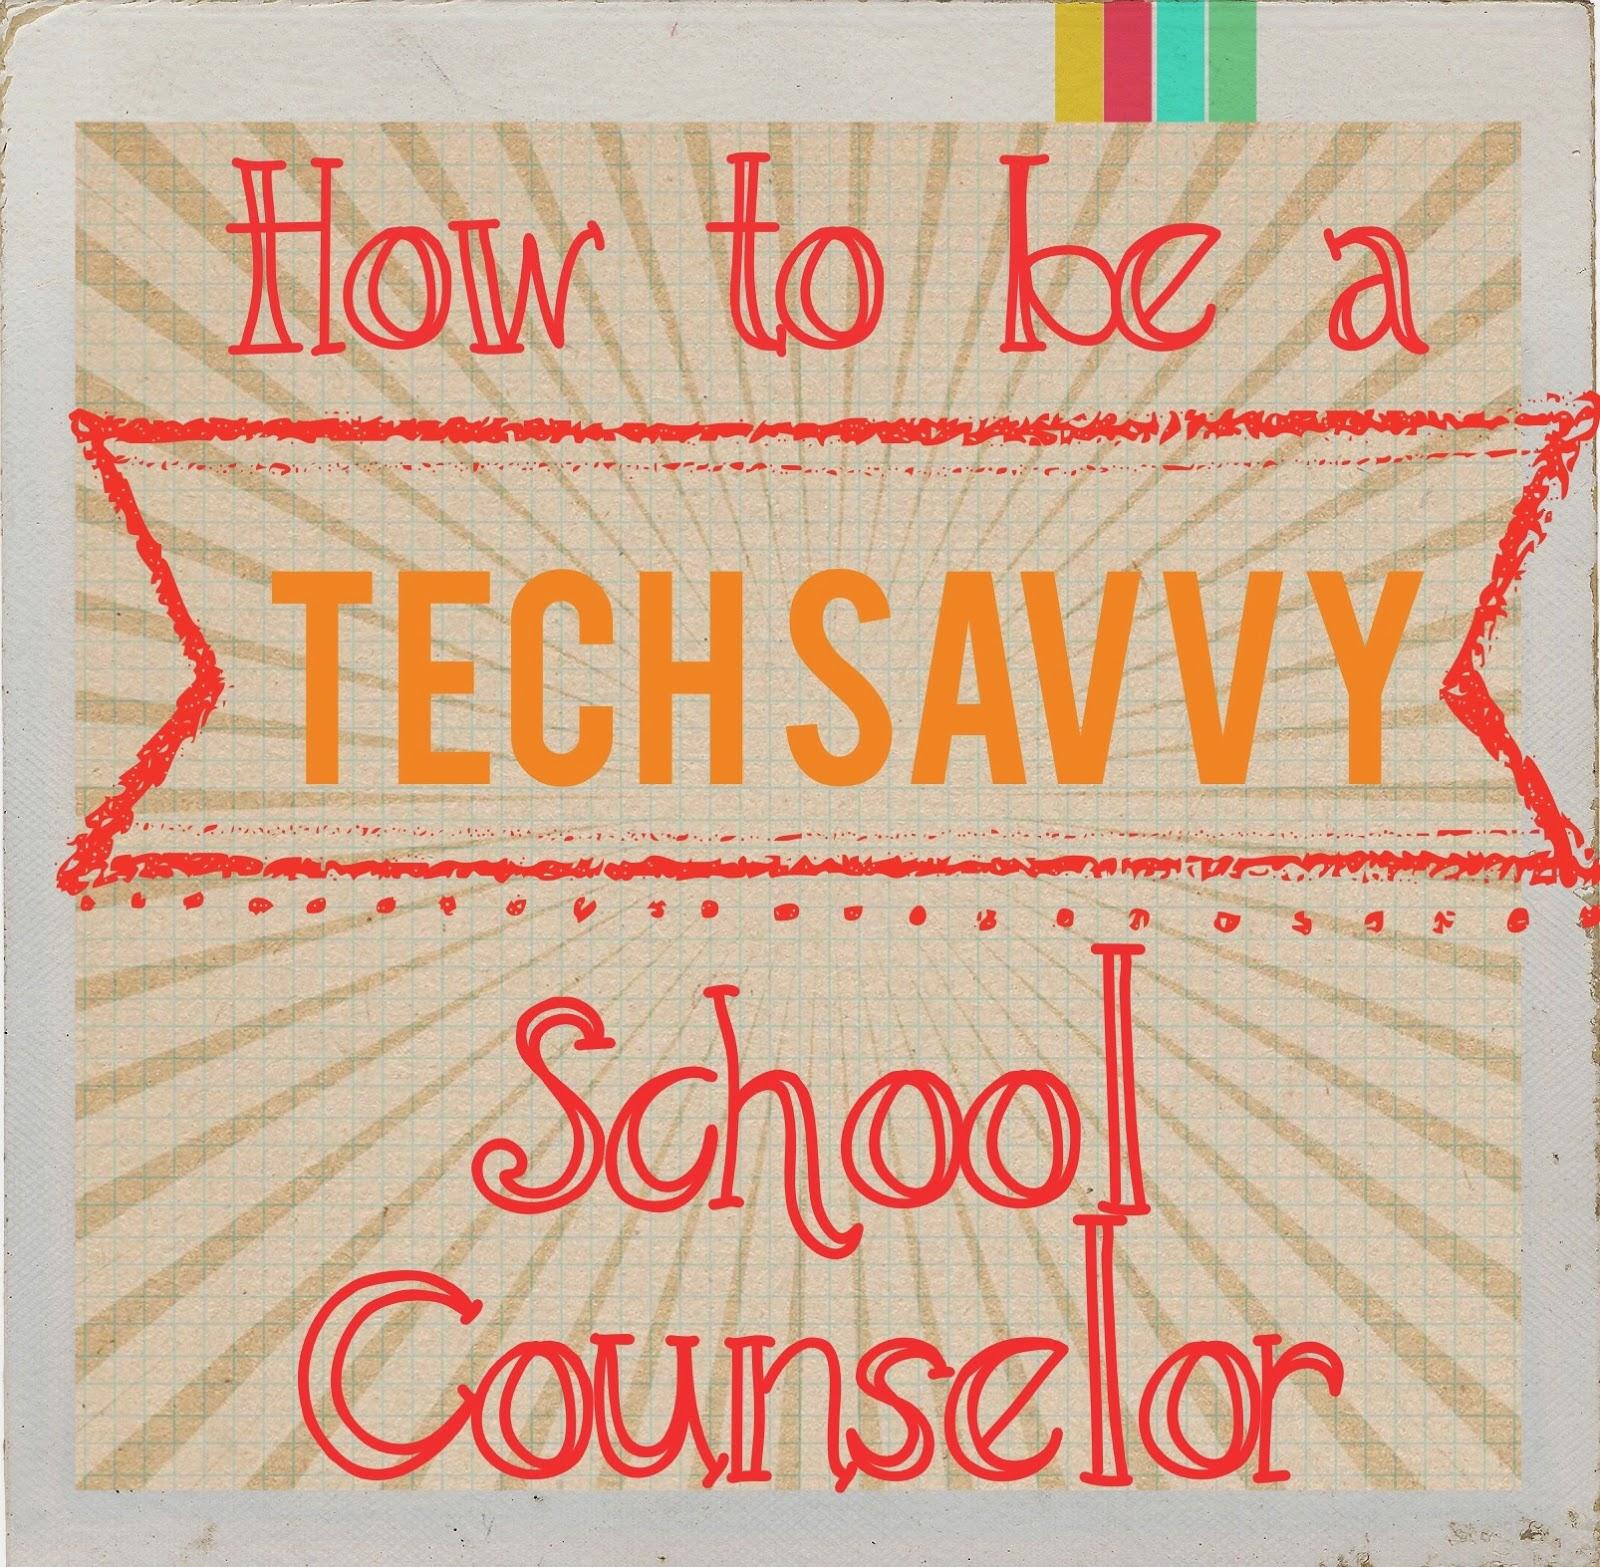 The Tech Savvy School Counselor